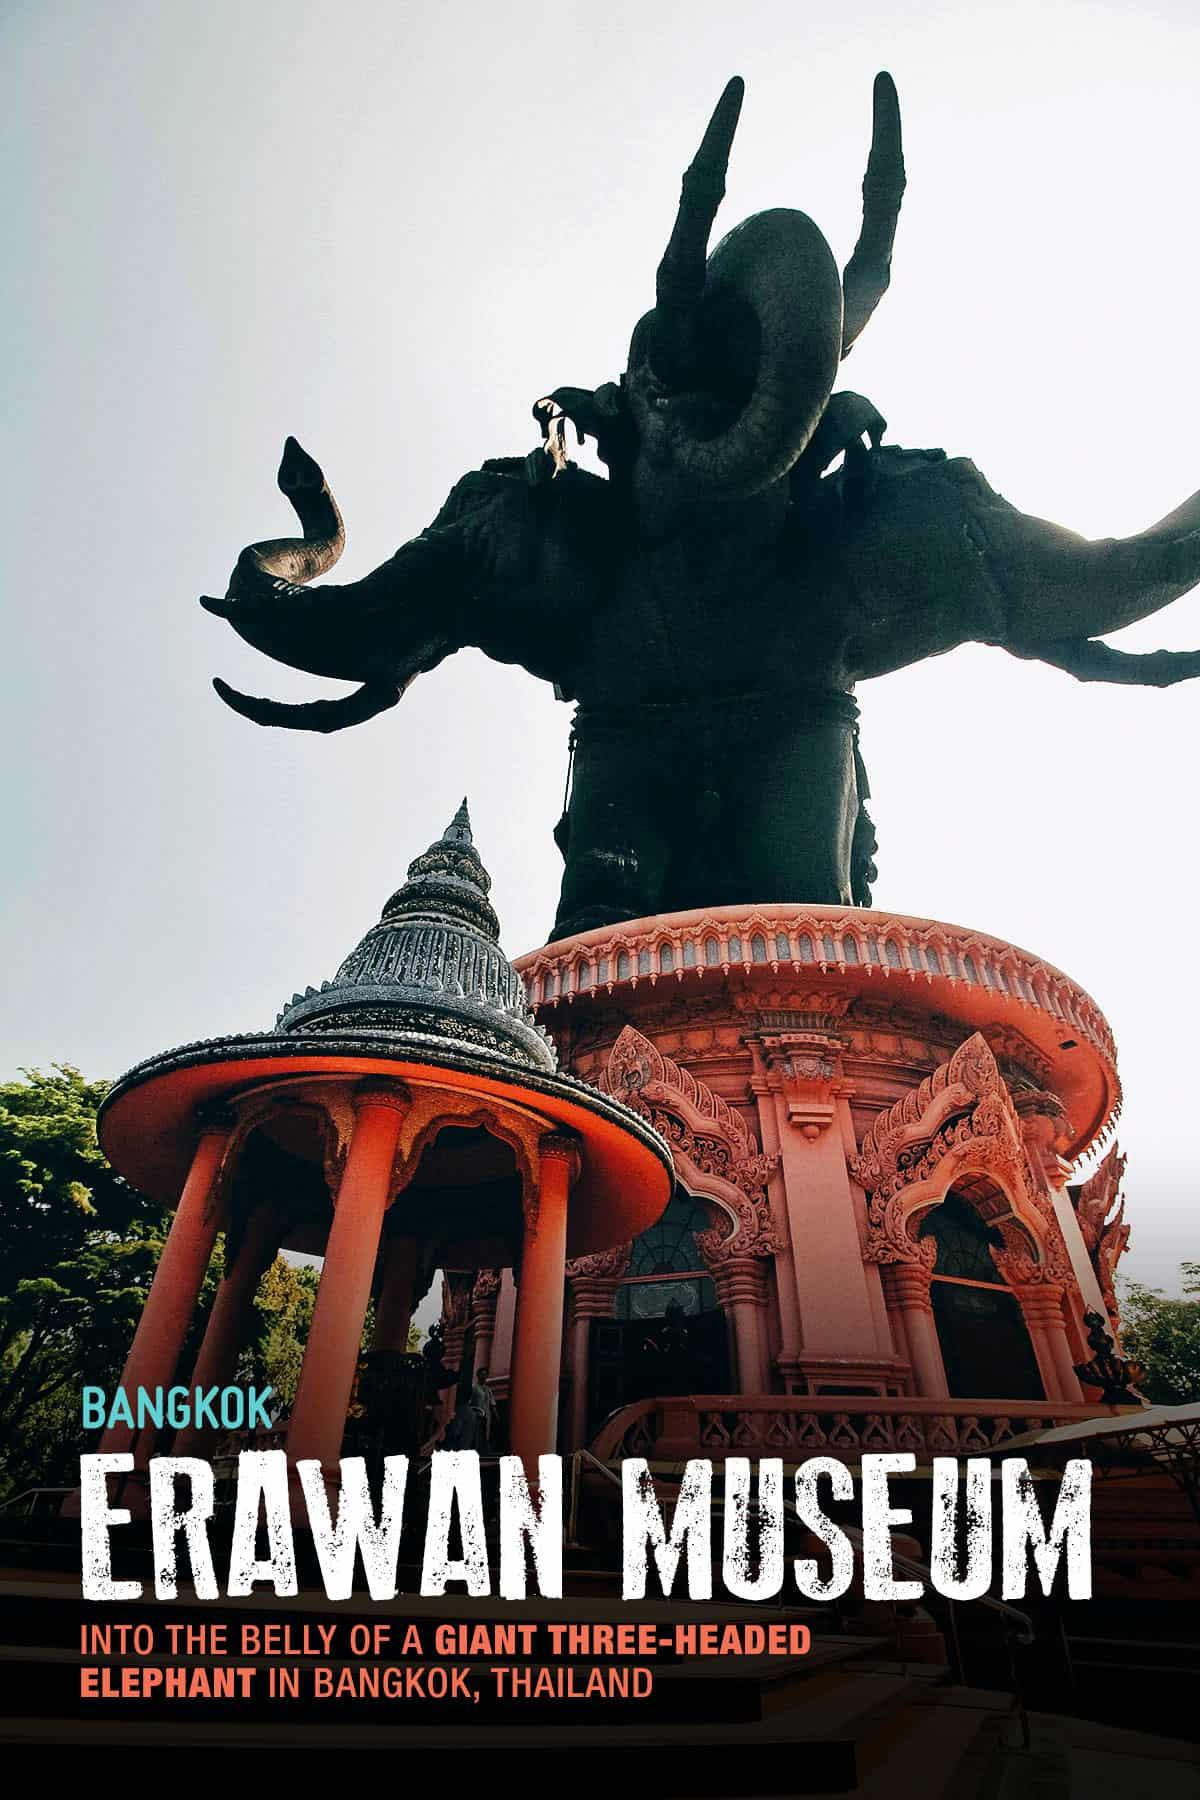 Giant three-headed elephant at Erawan Museum in Bangkok, Thailand